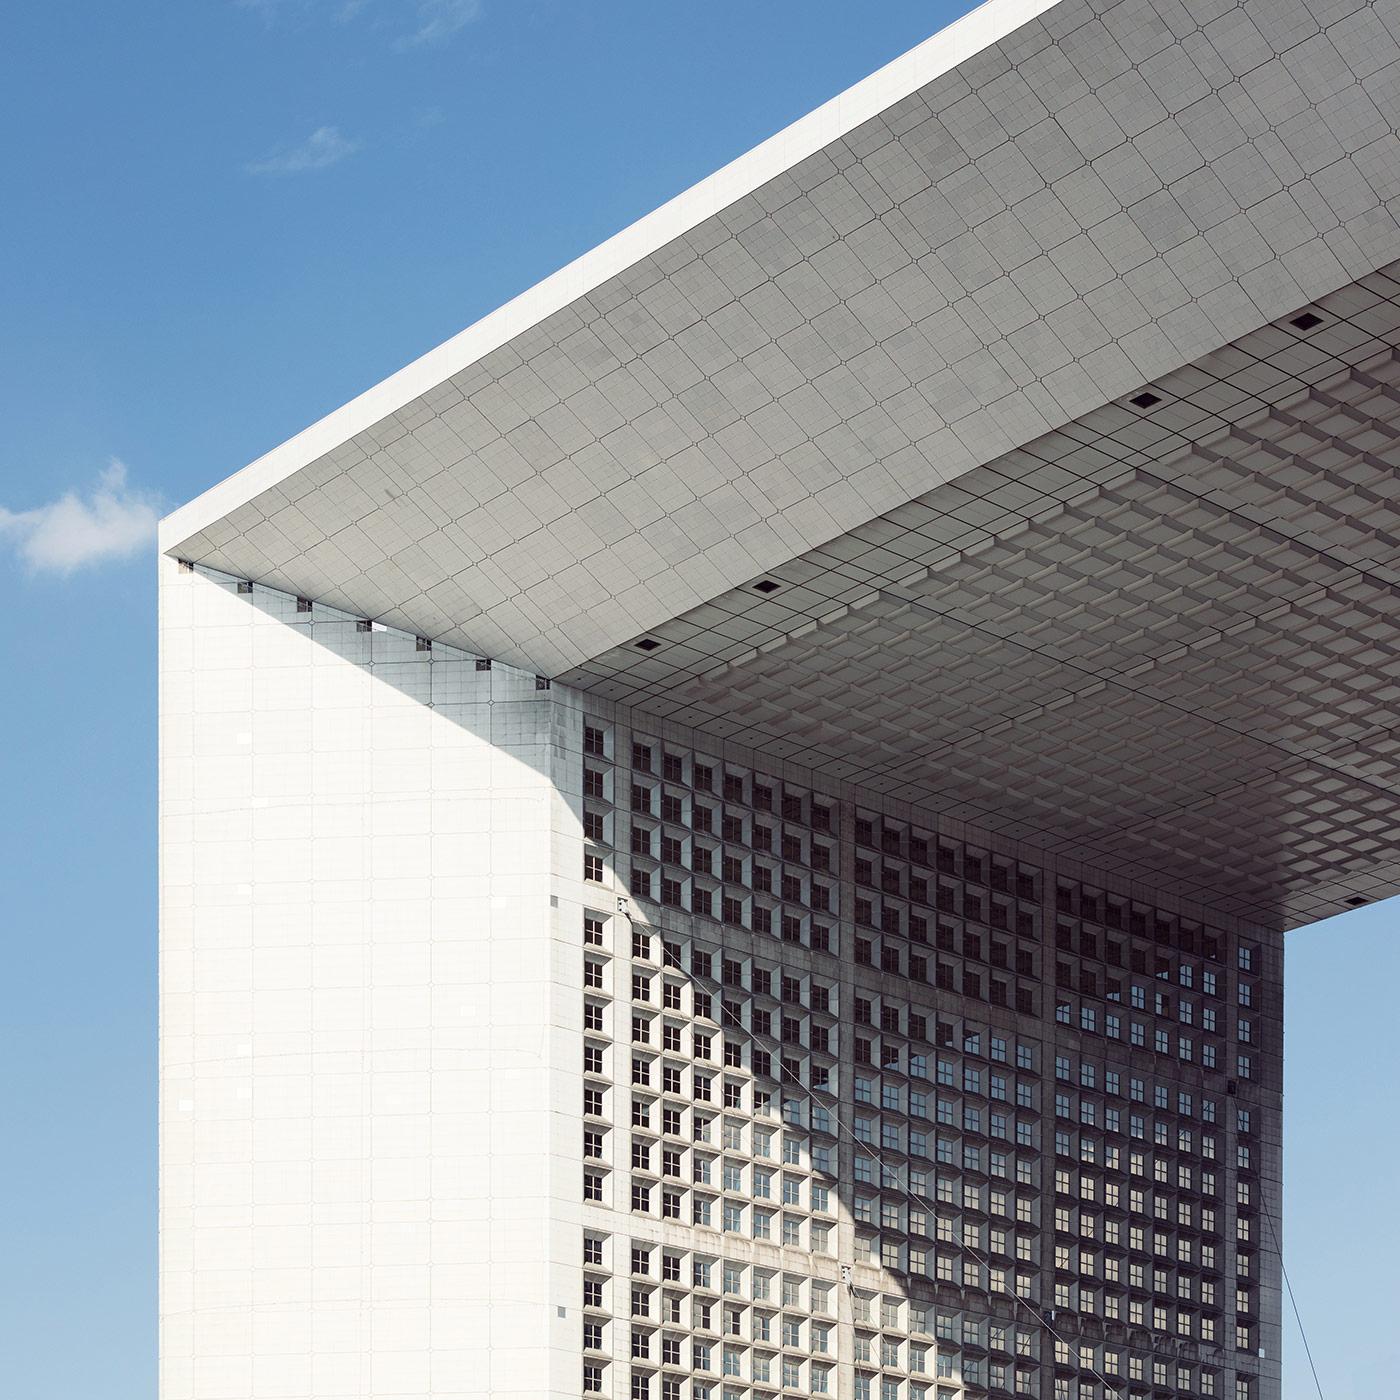 Grande Arche <br />Location: Paris, France <br />Architects: Otto von Spreckelsen and Paul Andreu